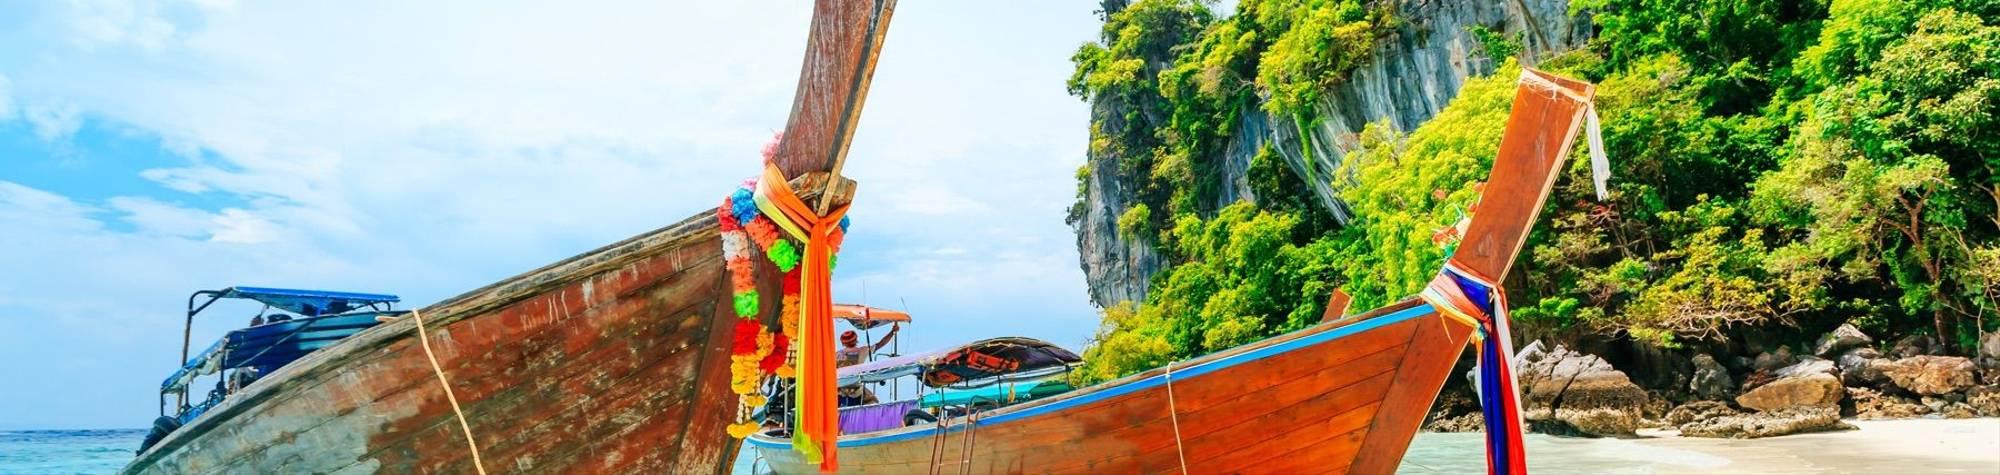 Longtail Boats in Phuket